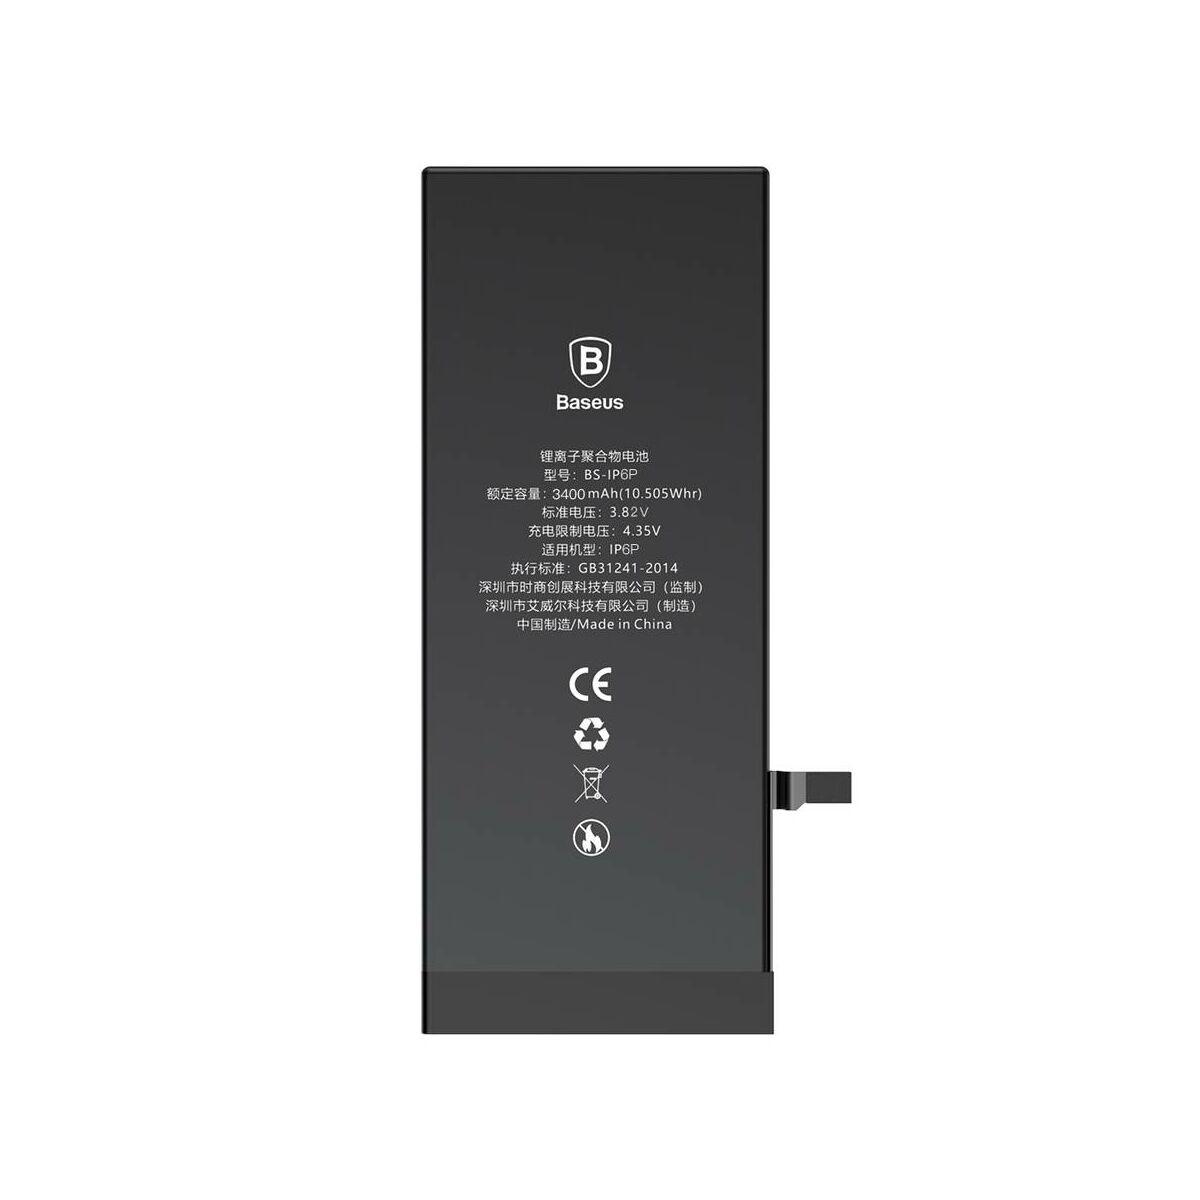 Baseus nagy teljesítményű akkumulátor iPhone 6 Plus-hoz, 3400 mAh (ACCB-BIP6P)